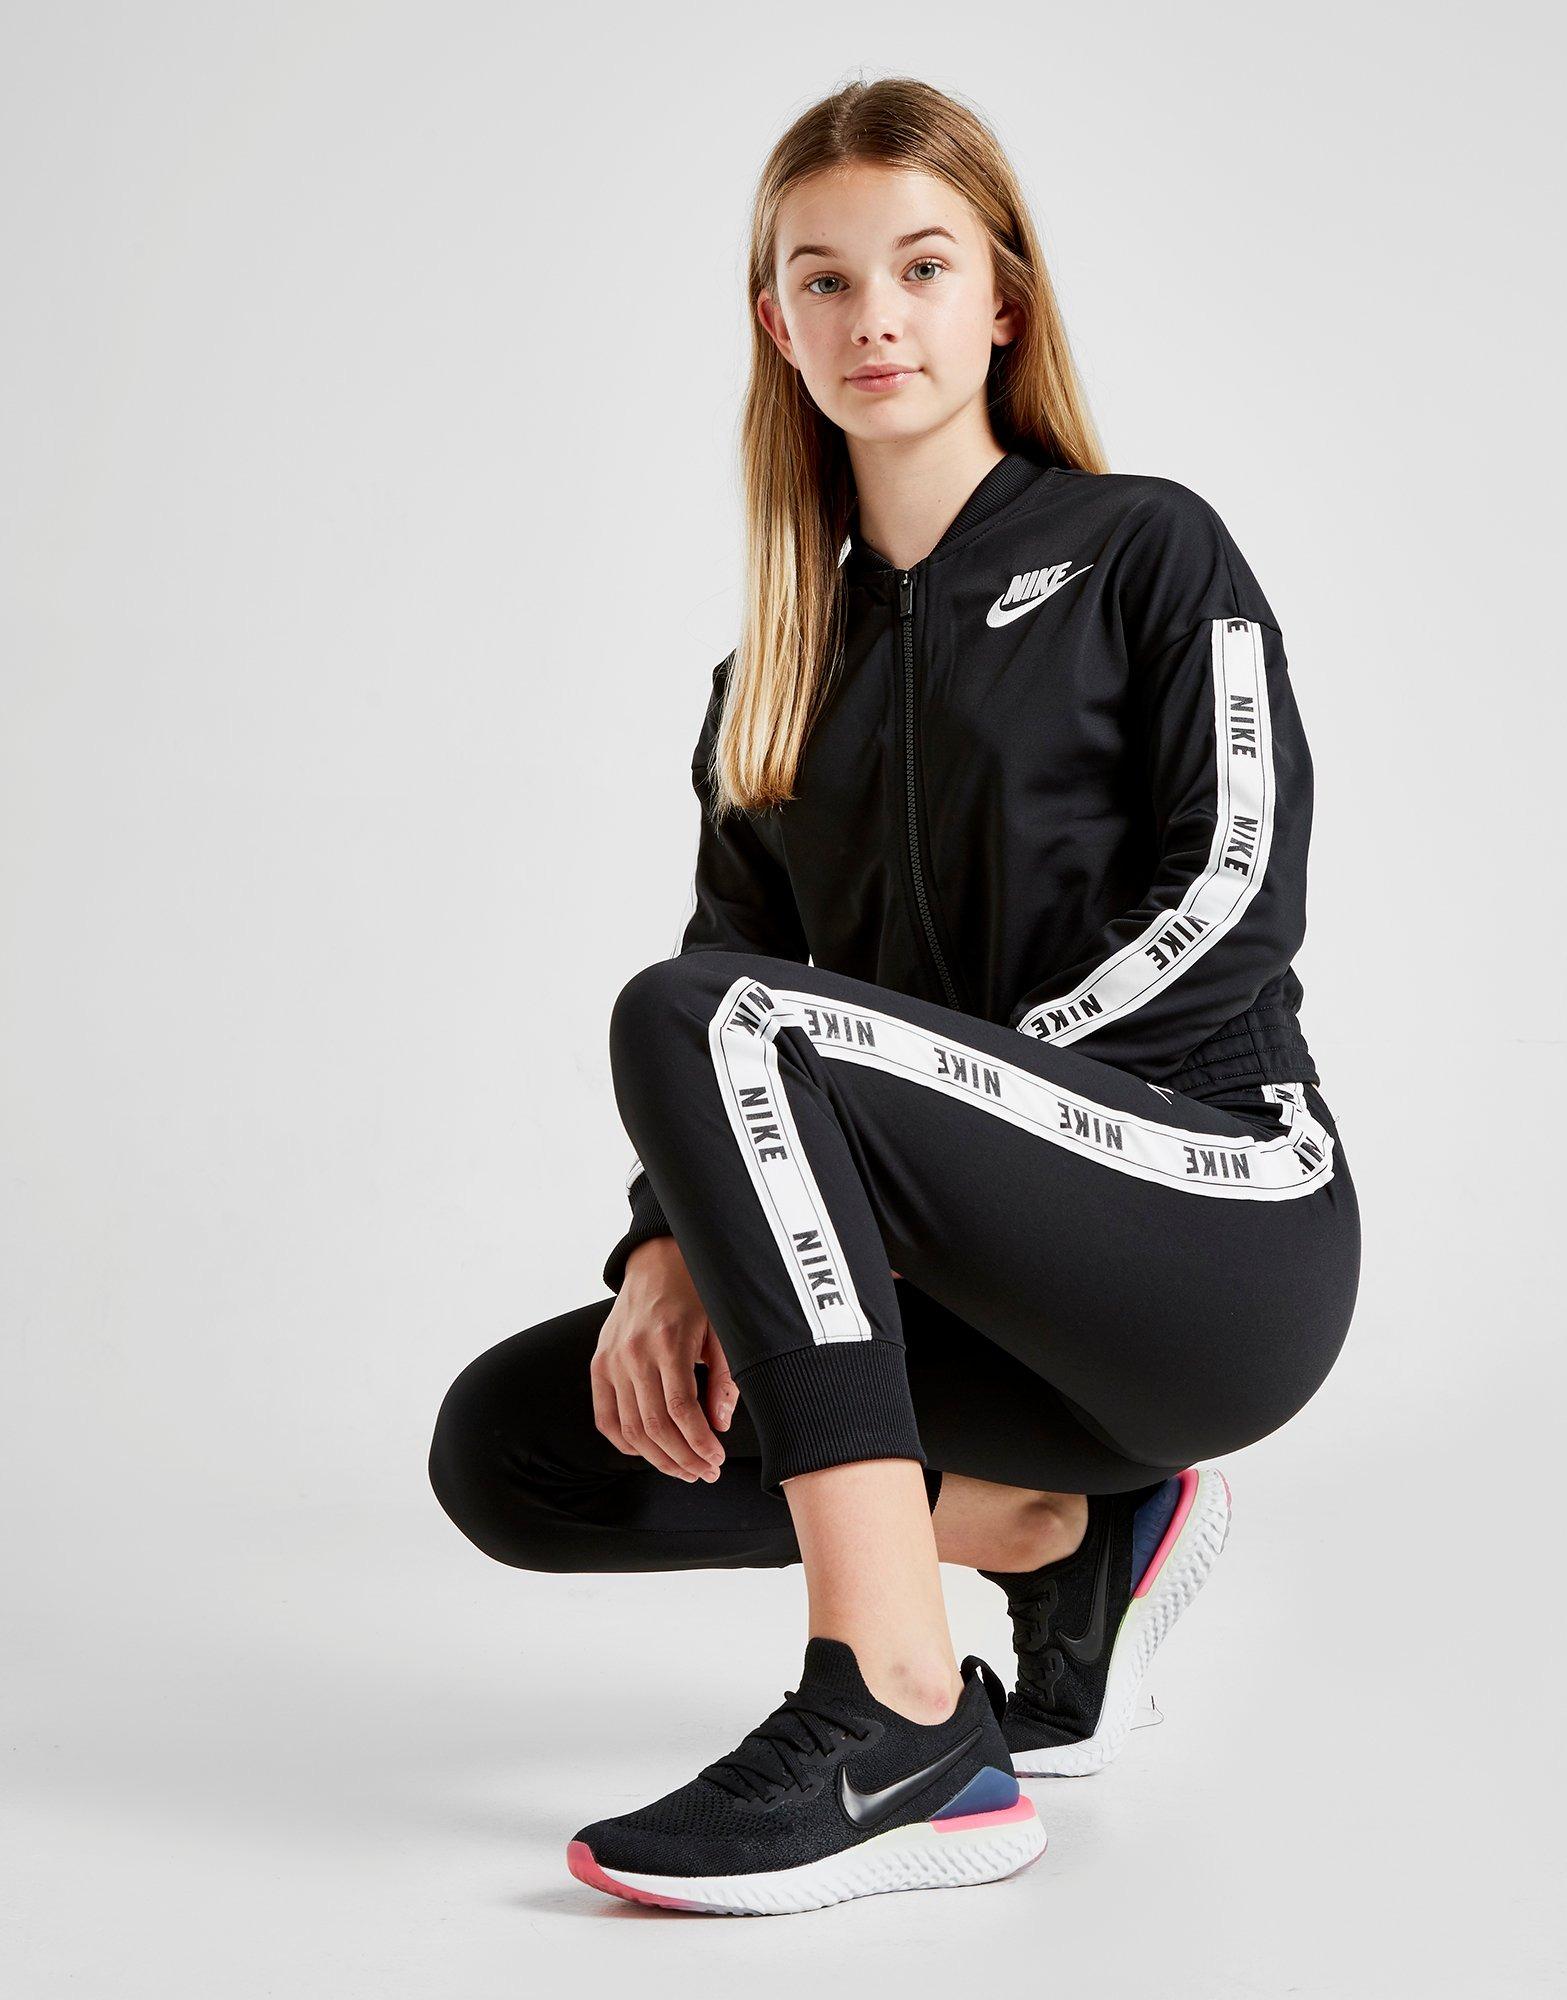 survetement adidas noir fille jd sport